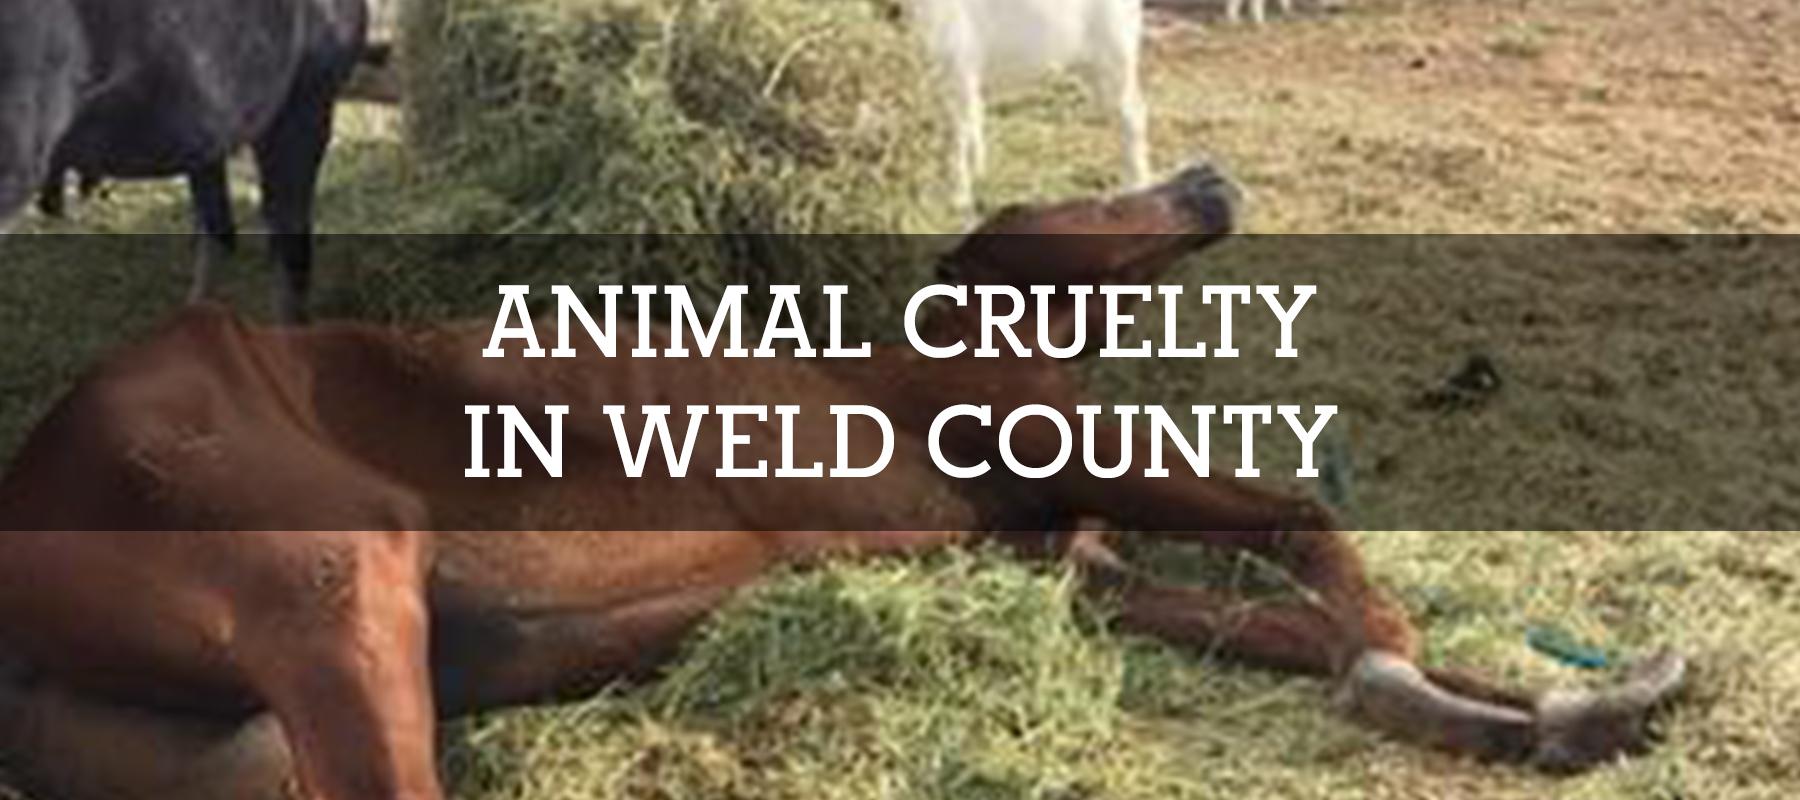 ANIMAL CRUELTY IN WELD COUNTY COLORADO